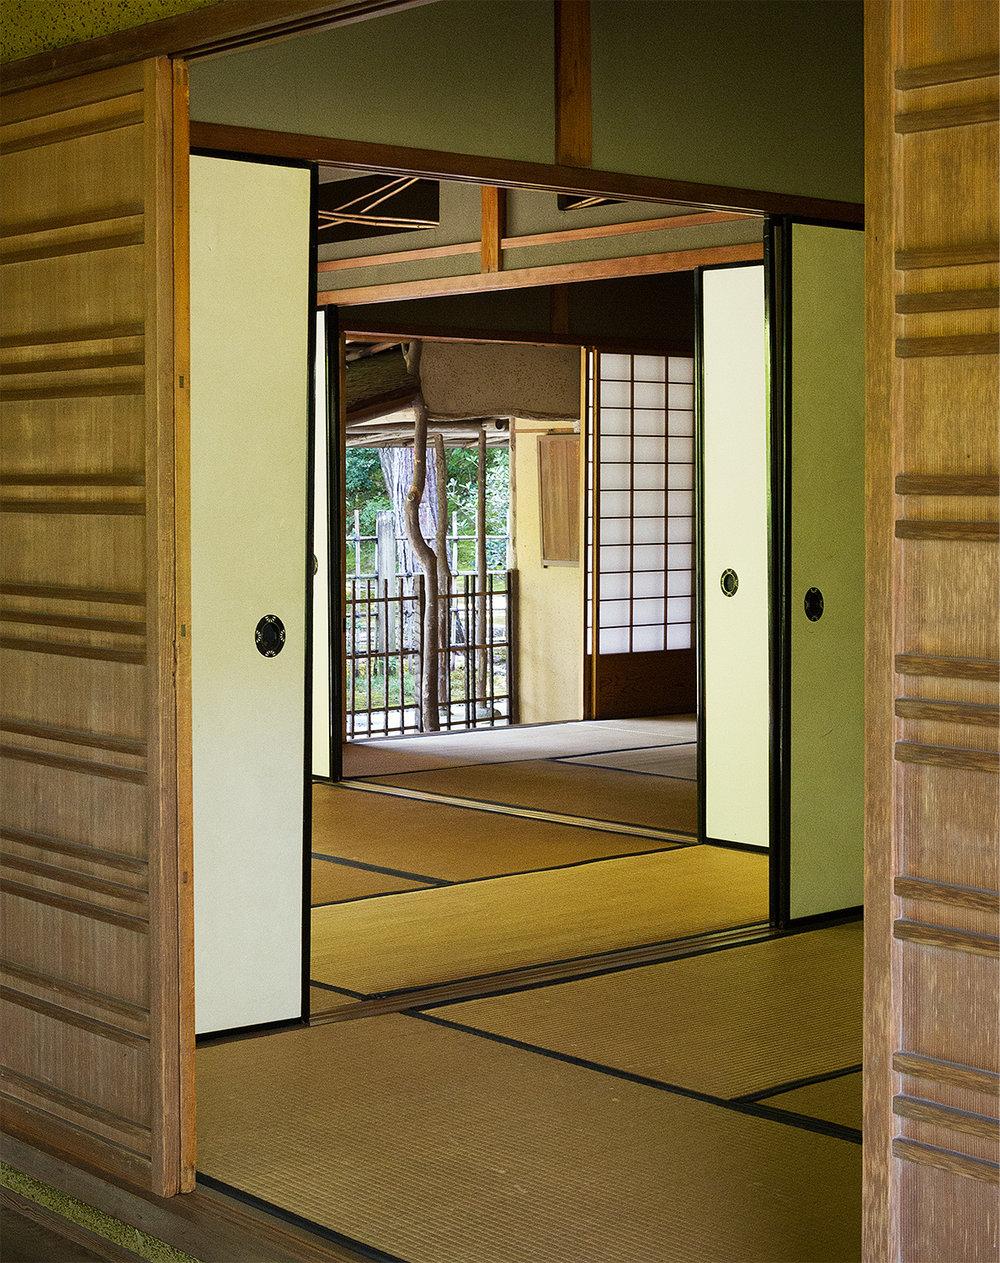 Nara Teahouse